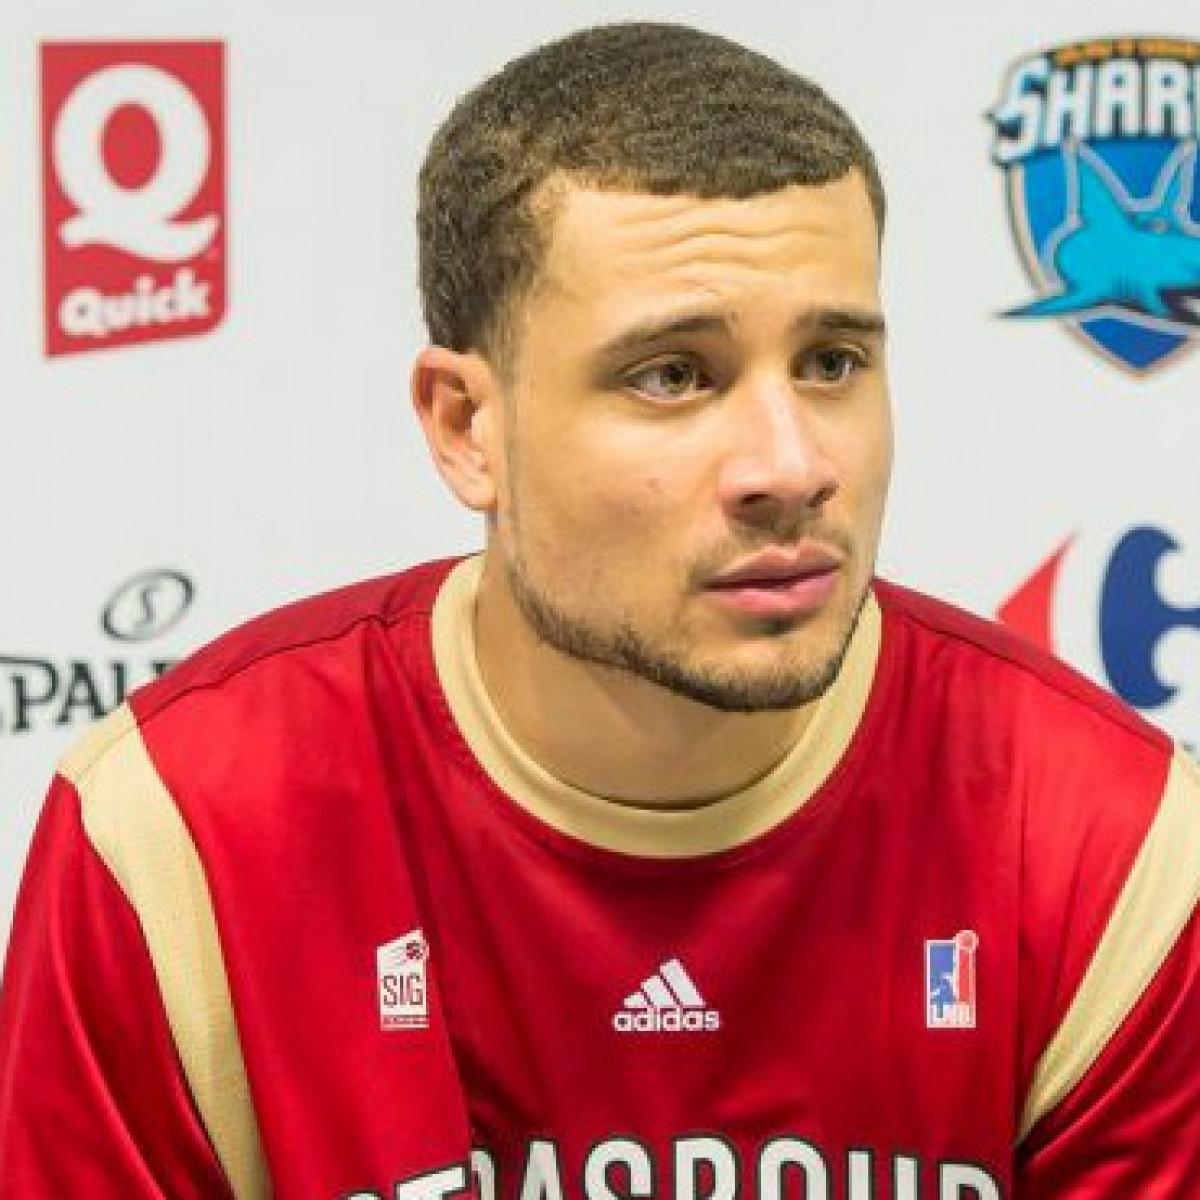 Photo of Kyle Weems, 2015-2016 season